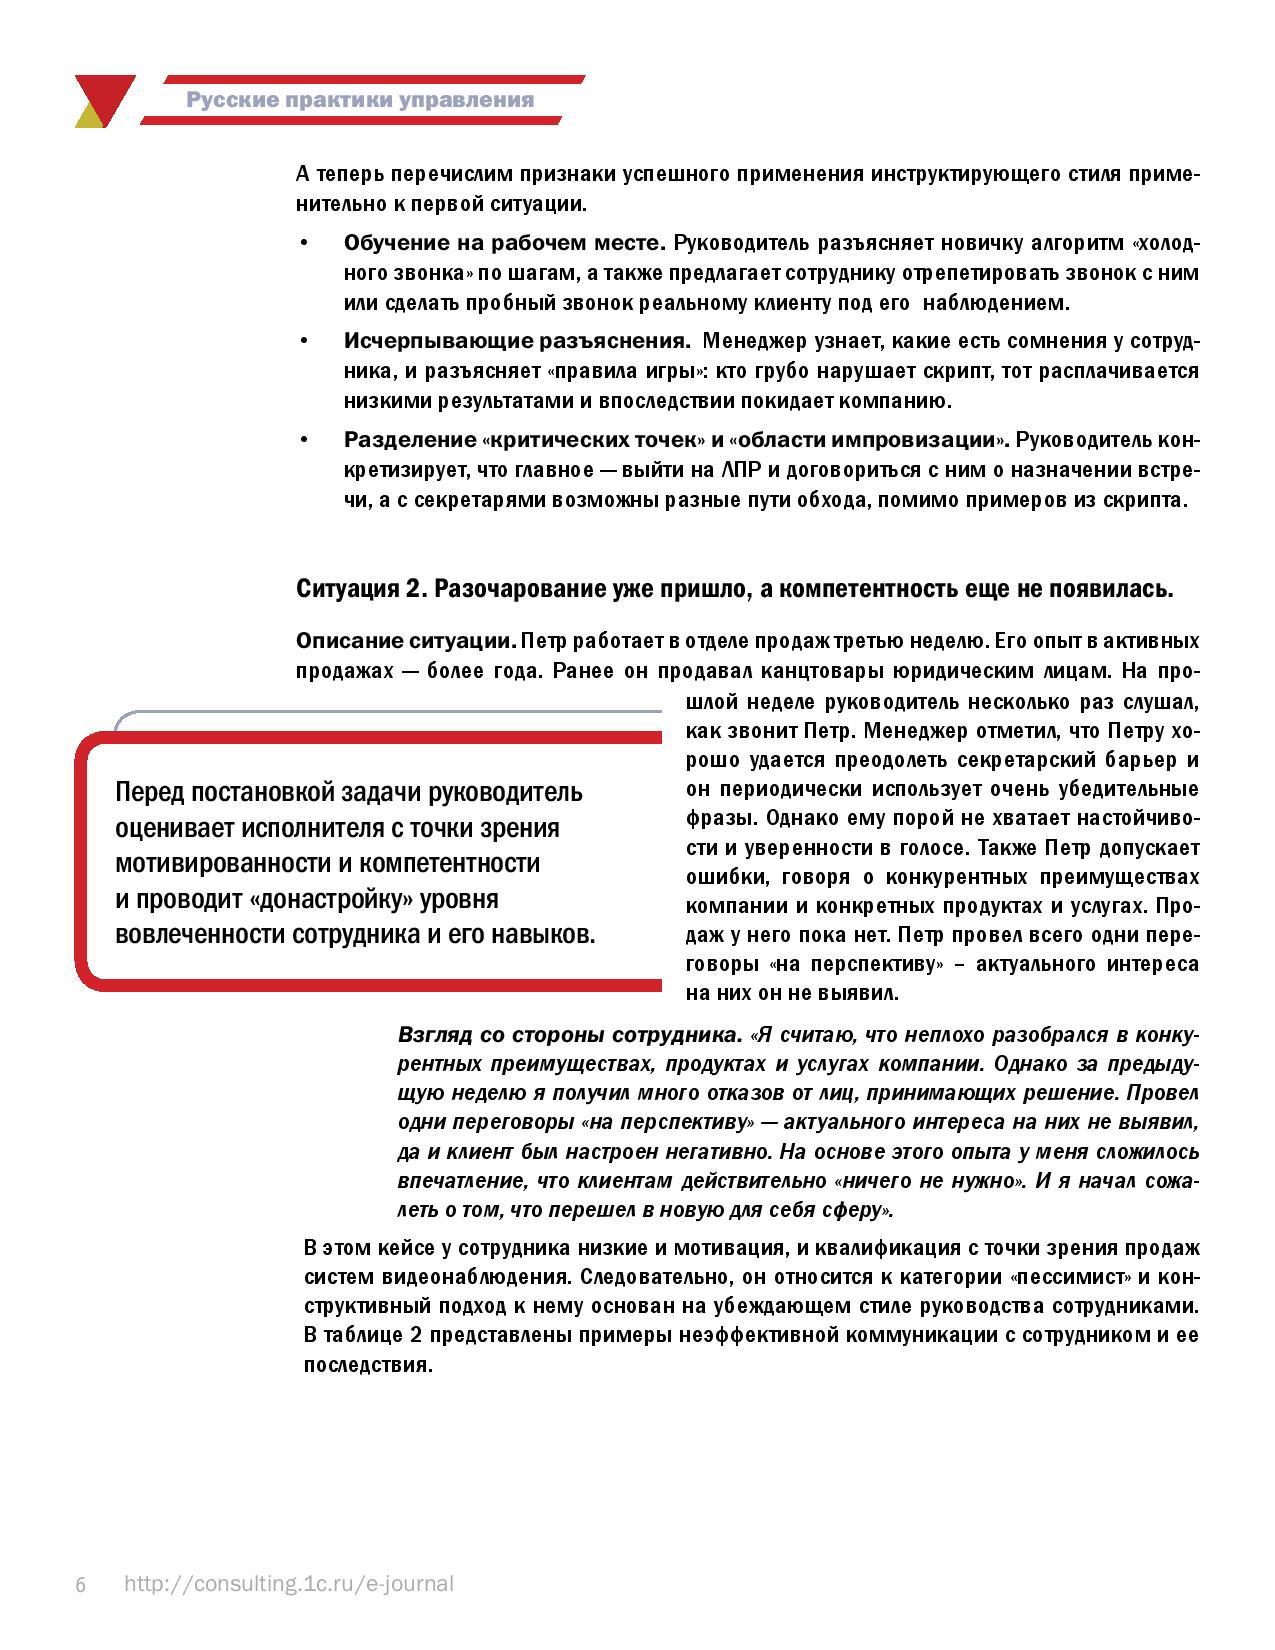 Situacionnyy_podhod_Cast__1._Upravlaem_predpriatiem__04_2015-page-006